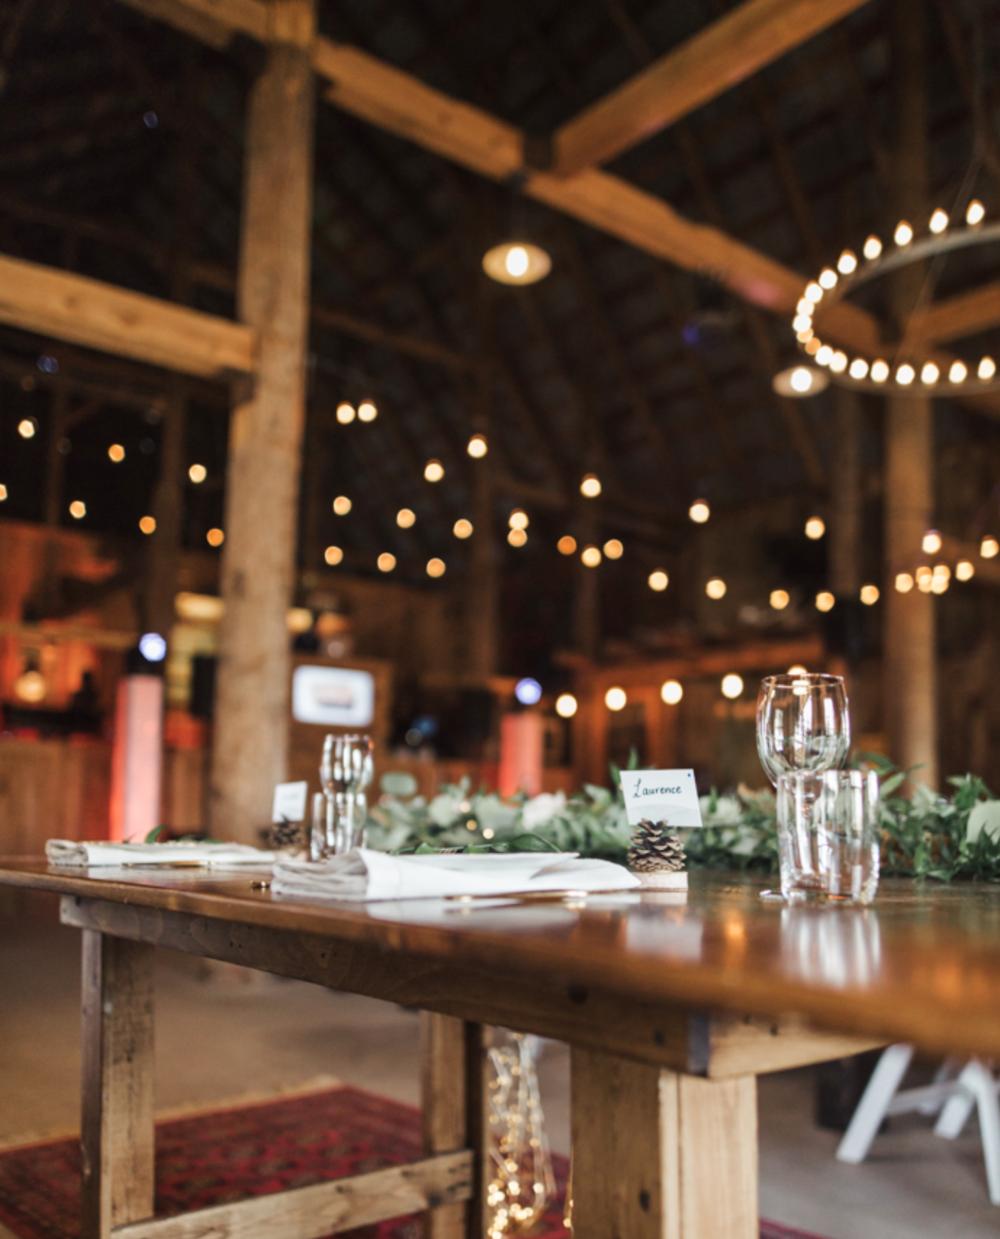 1161    Table en bois 6 pieds / Wooden 6 foot table    1